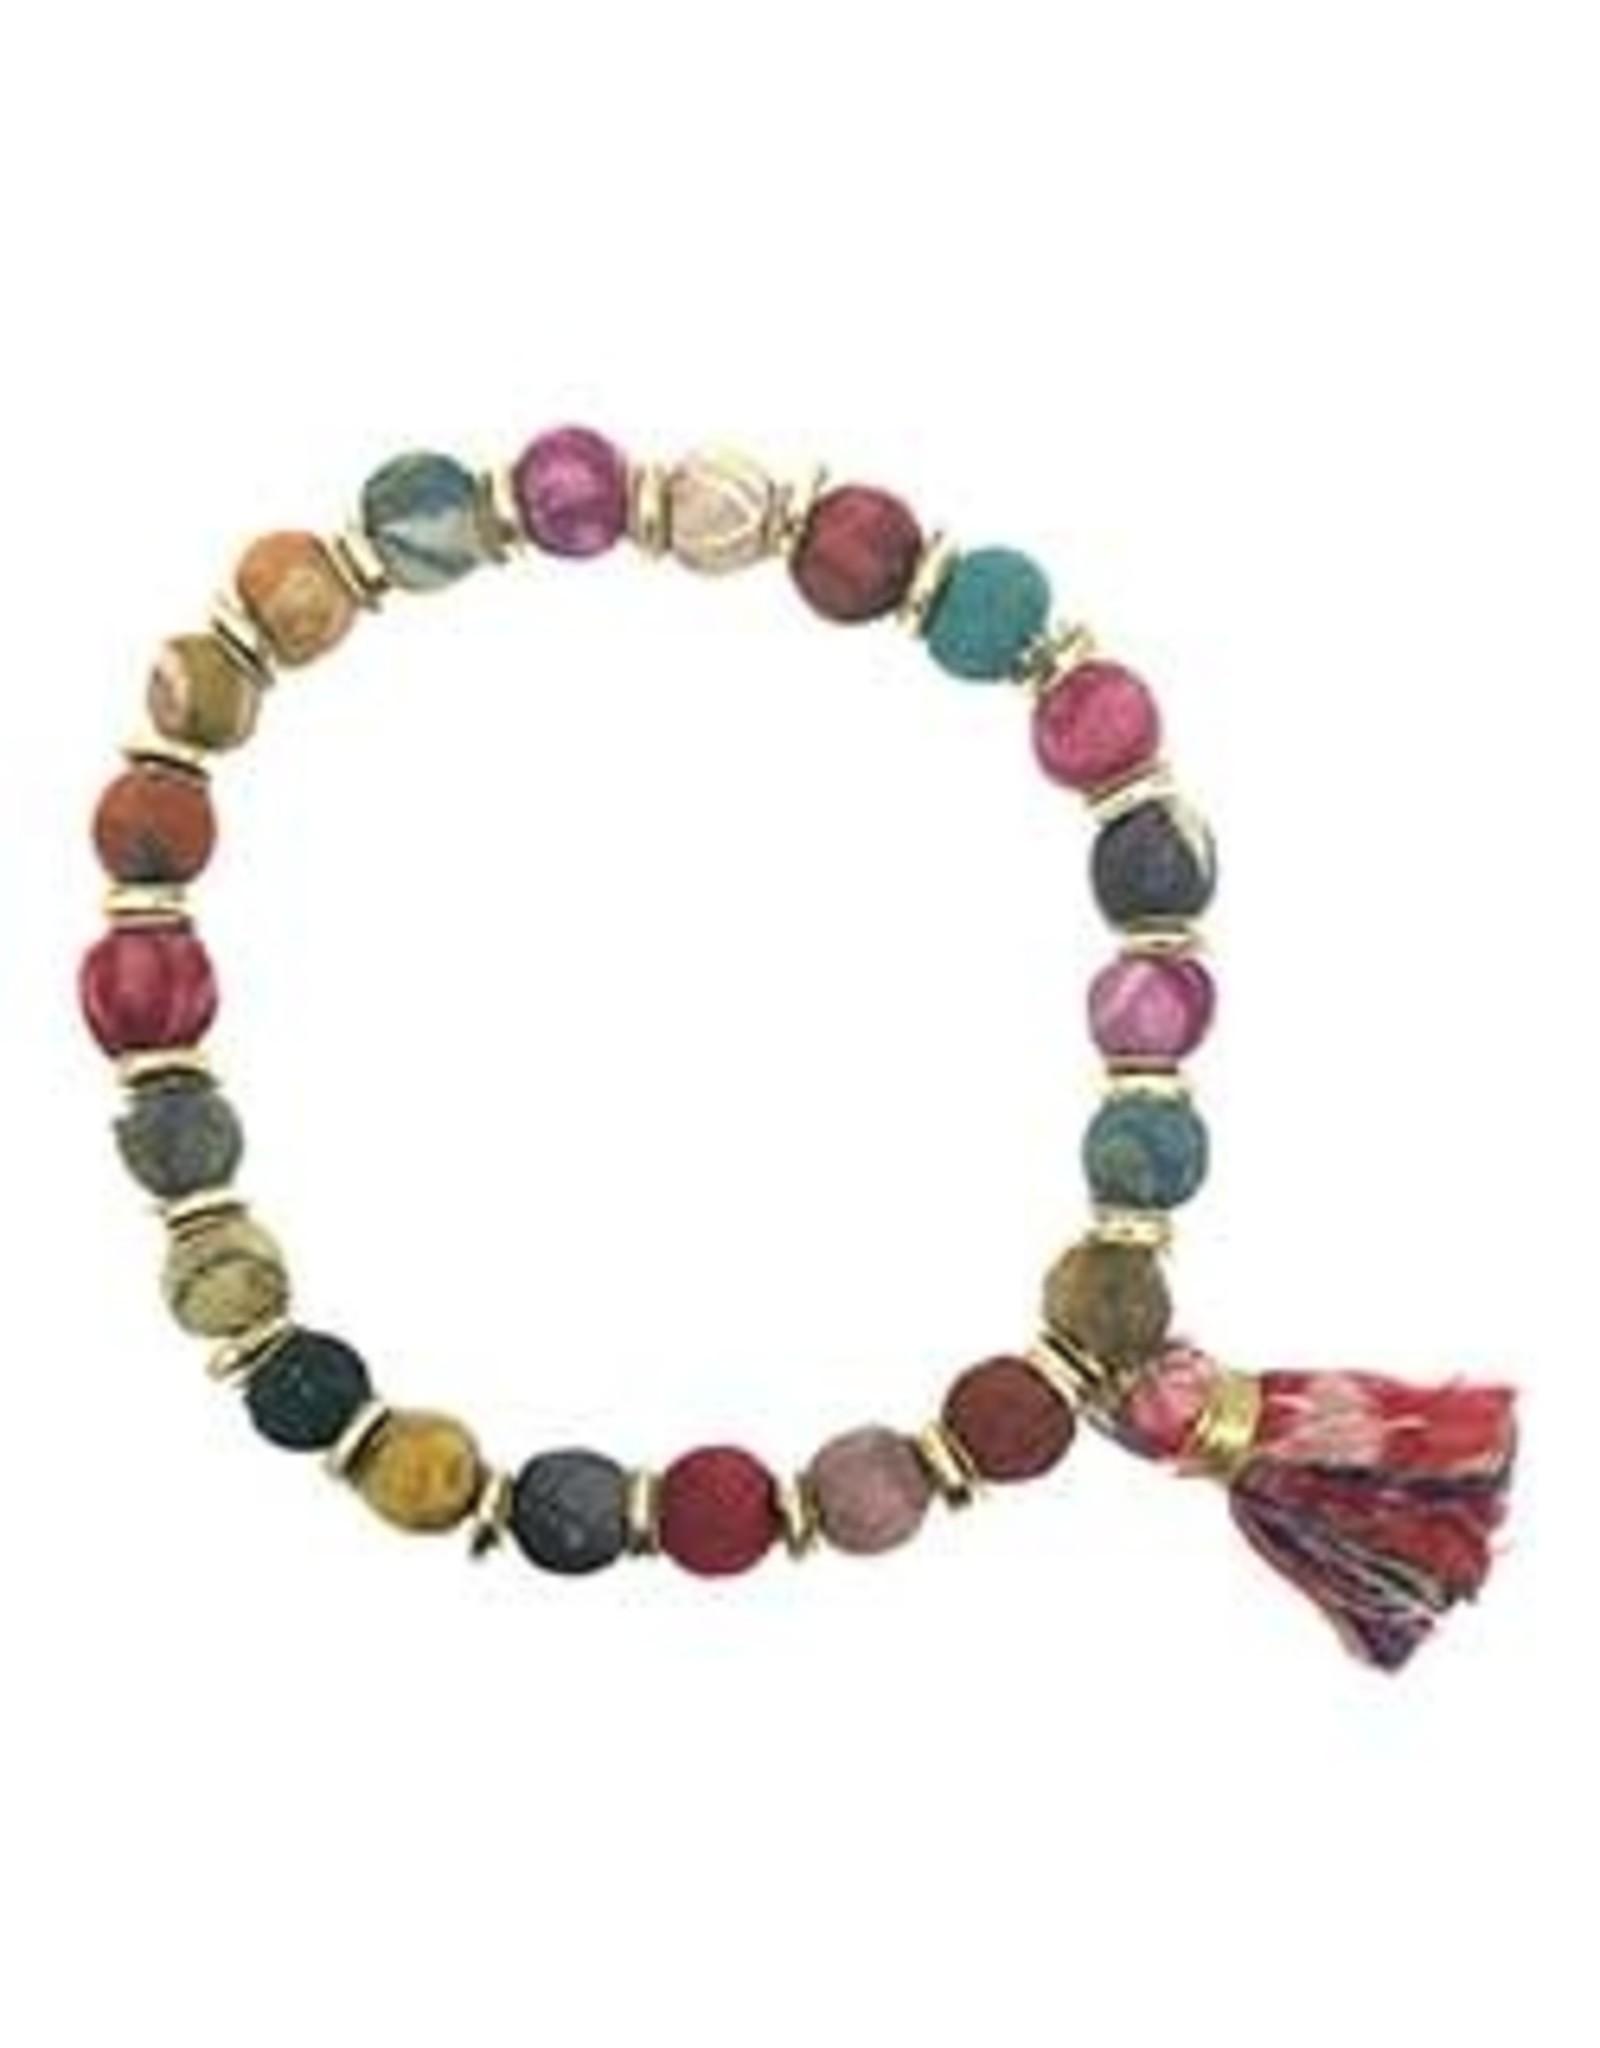 Sequined Kantha Tassel Bracelet